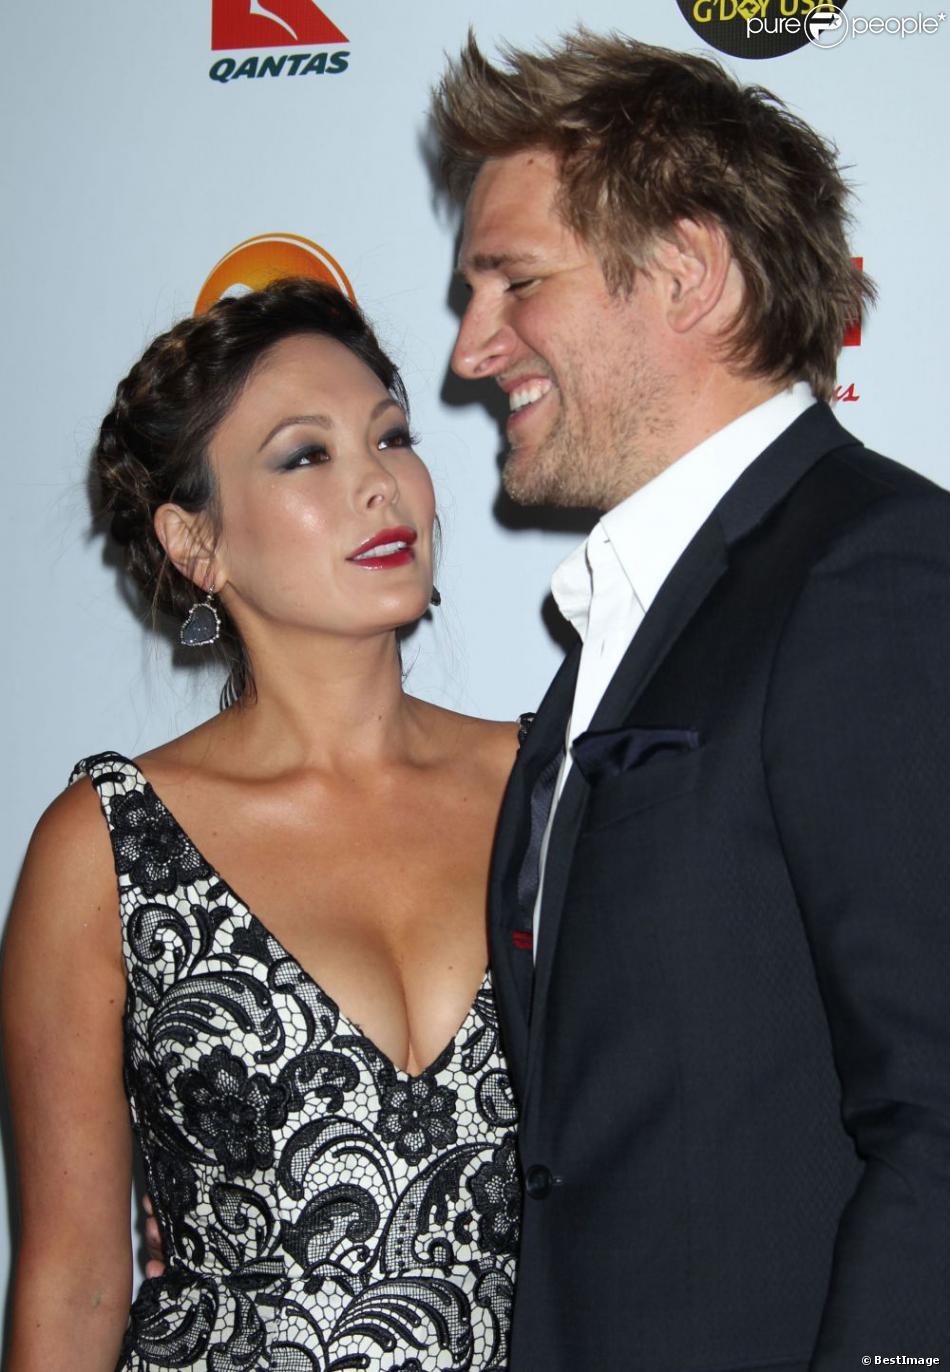 Lindsay Price et son mari Curtis Stone au Gala G'Day USA Los Angeles Black Tie 2013, le 12 janvier 2013.